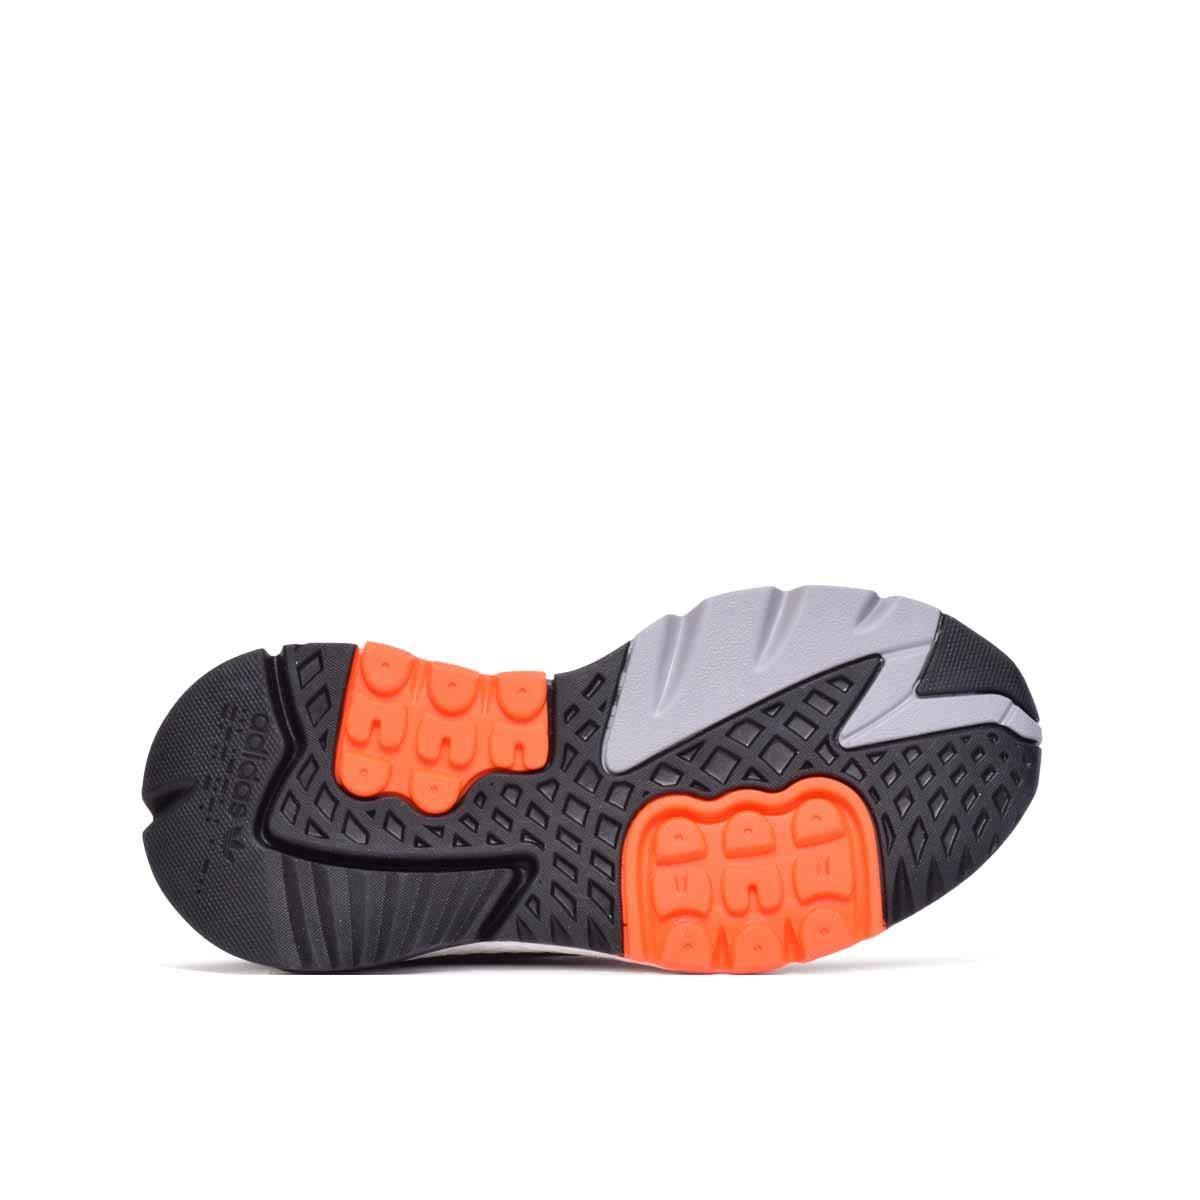 adidas Unisex-Erwachsene Nite Jogger Kletterschuhe